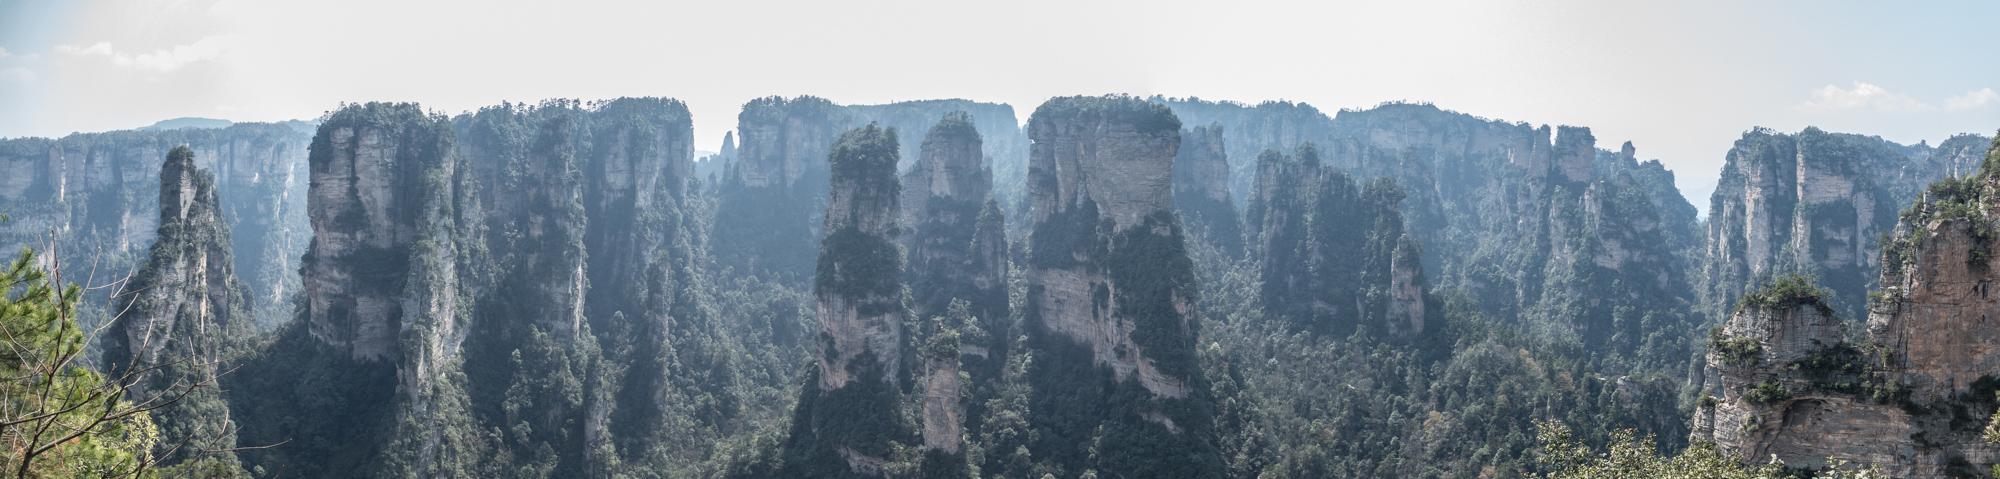 Panorama of pillars